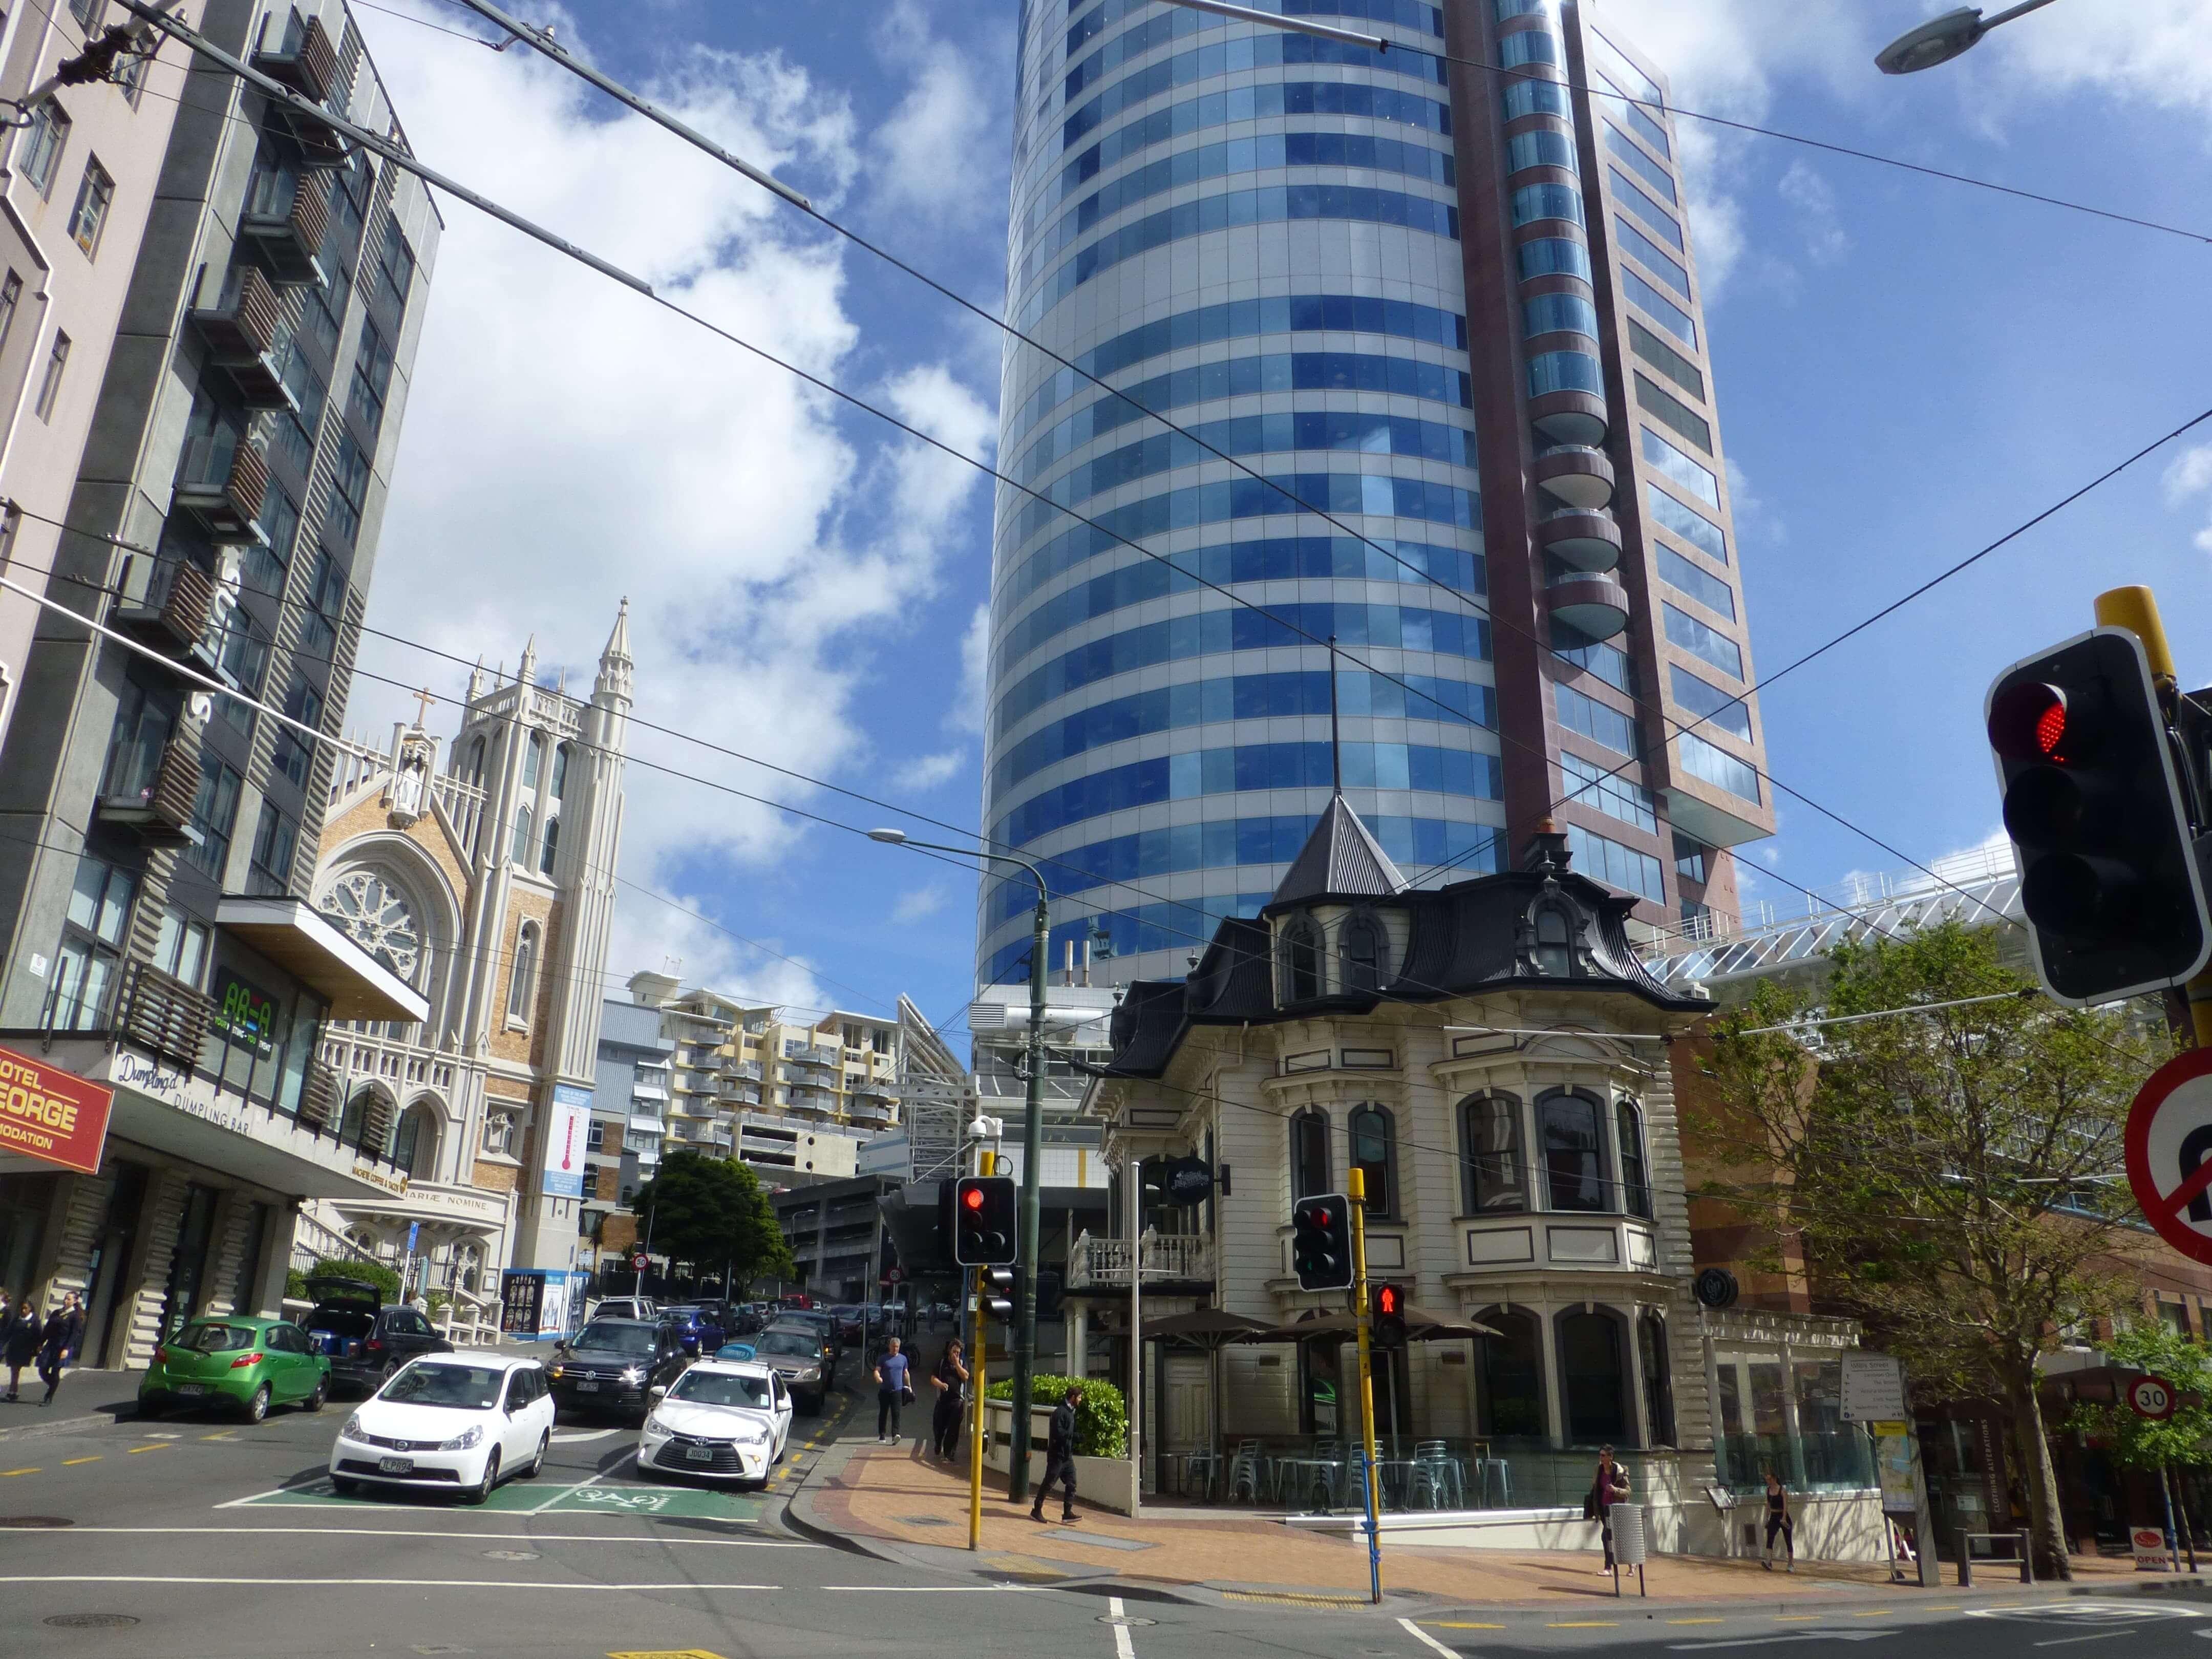 im Zentrum, Wellington, Neuseeland, Weit-weg.reisen 22